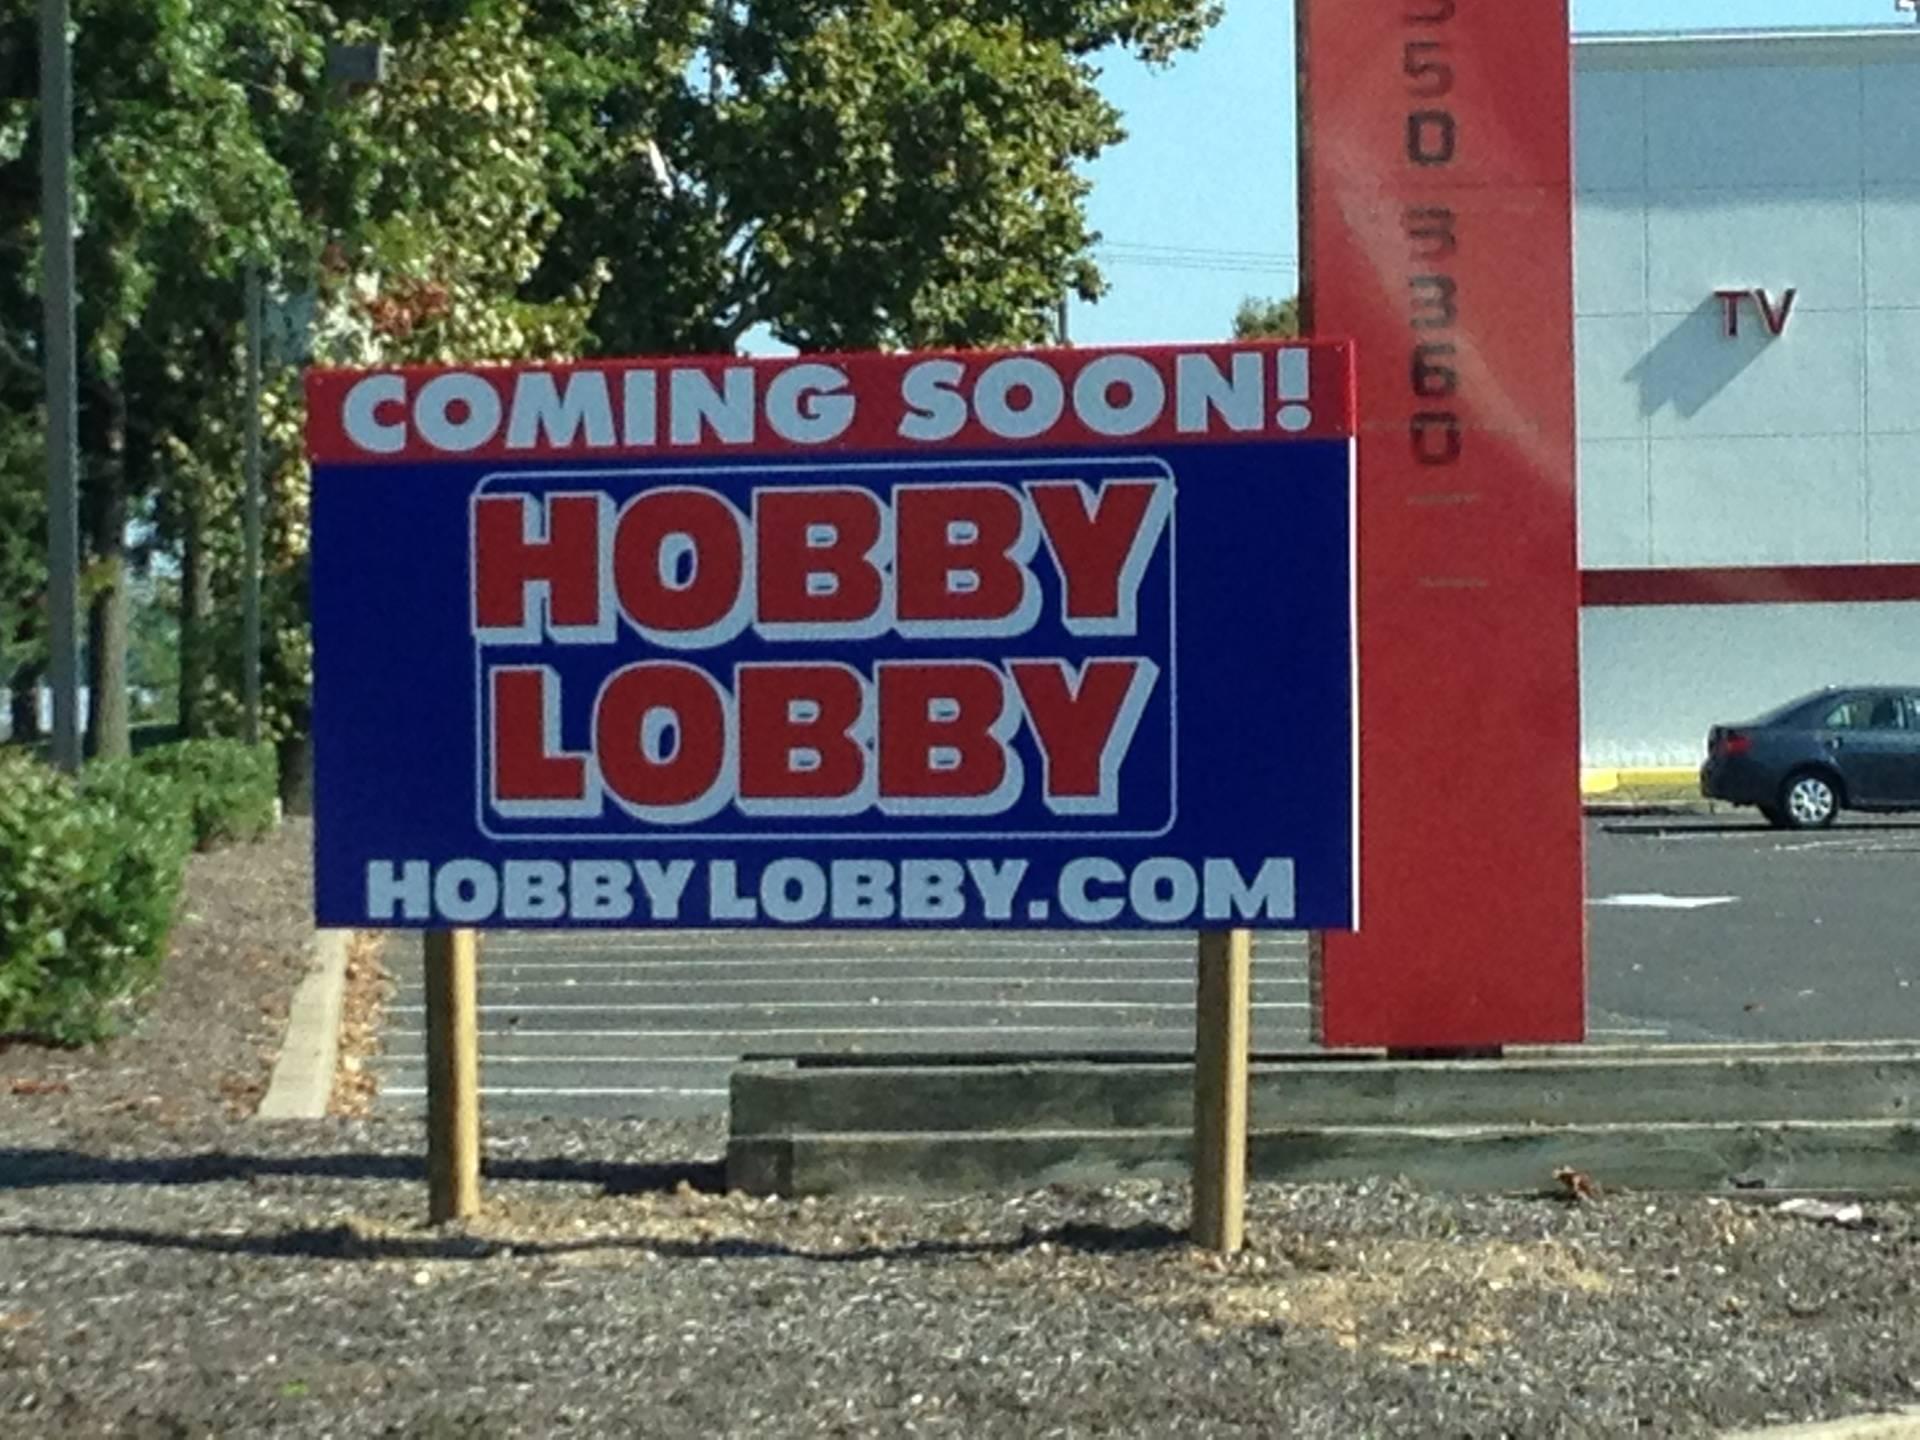 Hobby Lobby Lawrenceville NJ